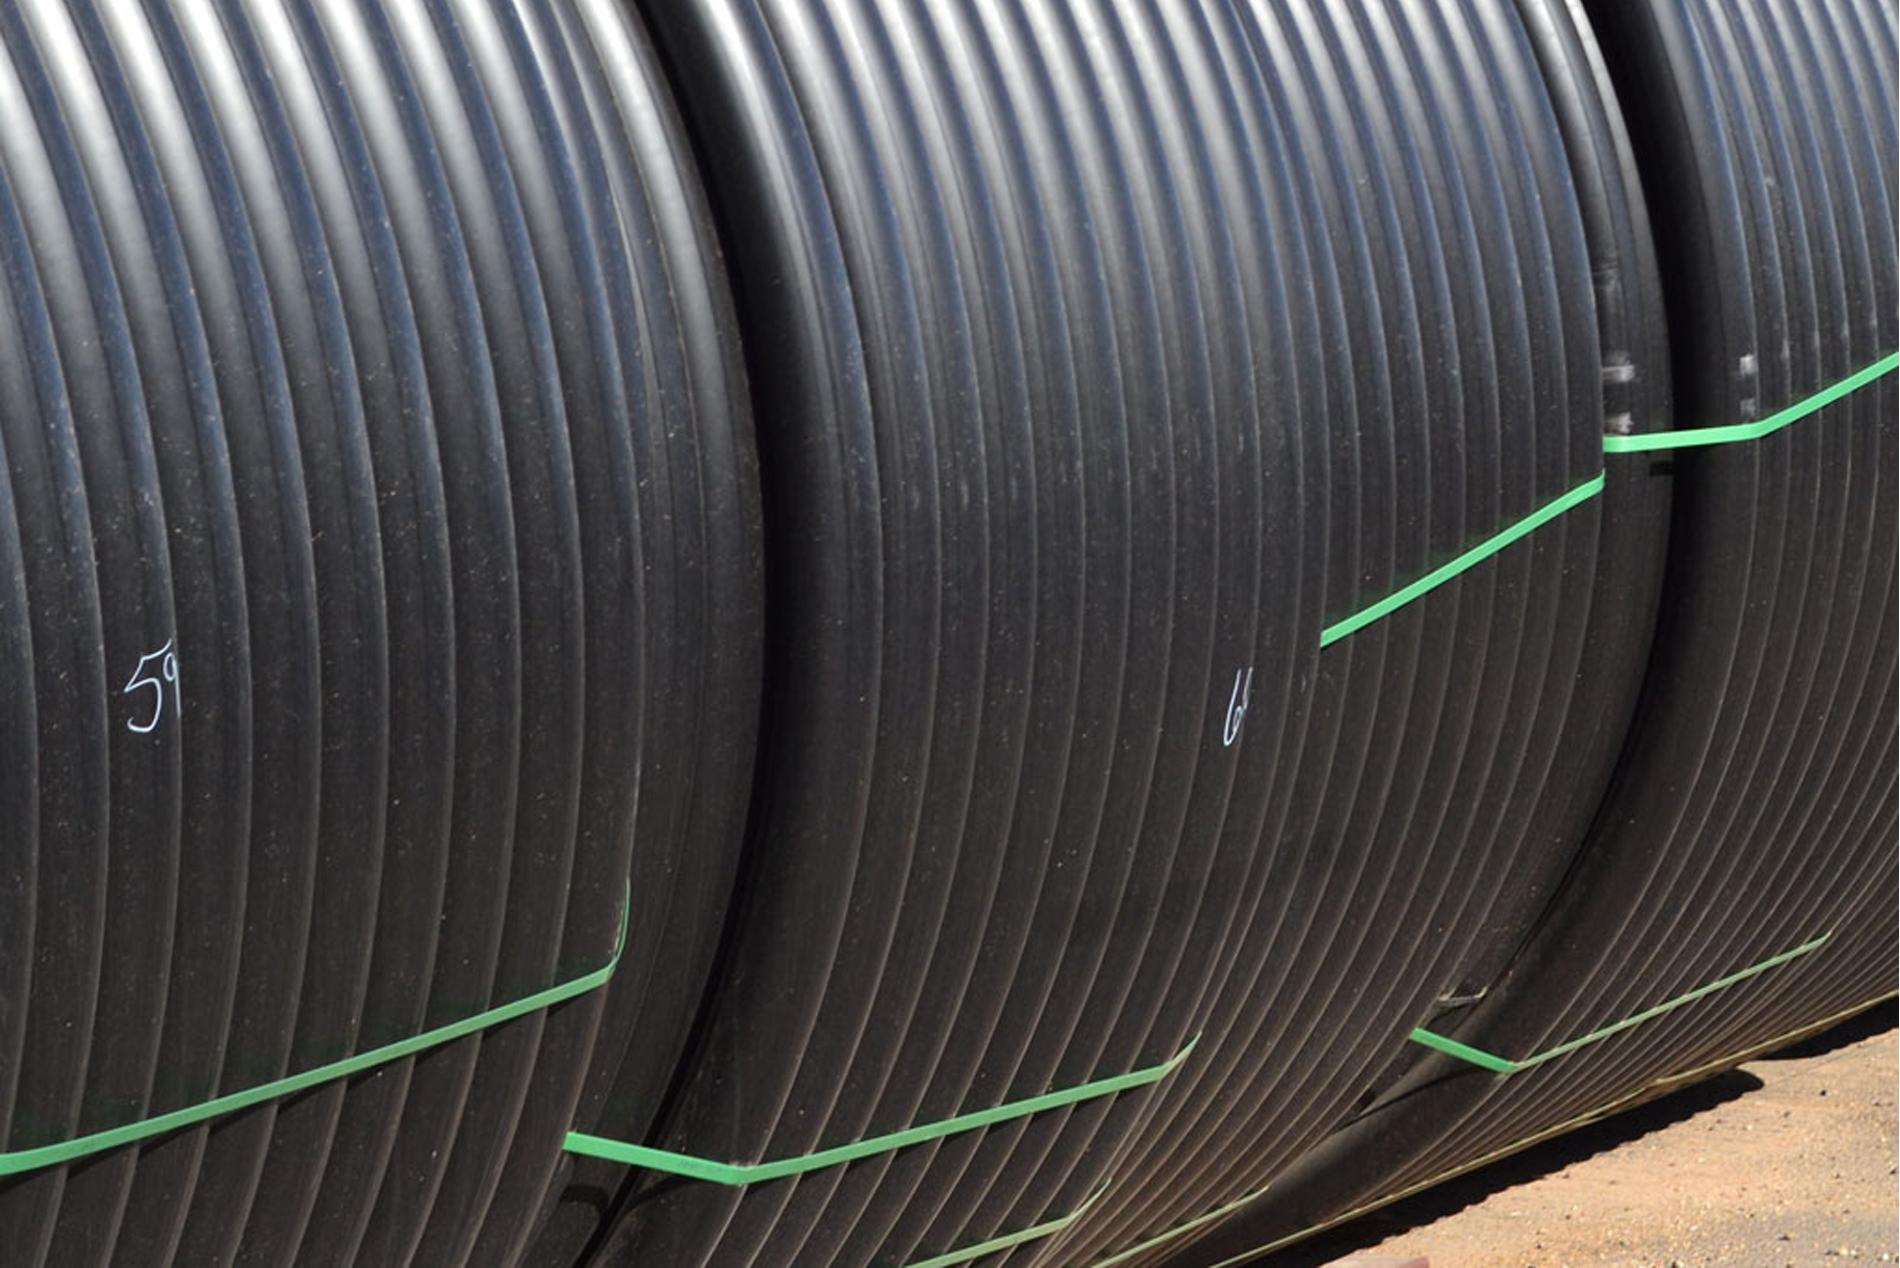 Hdpe Coil Pipes Maheshwari Industries Raipur